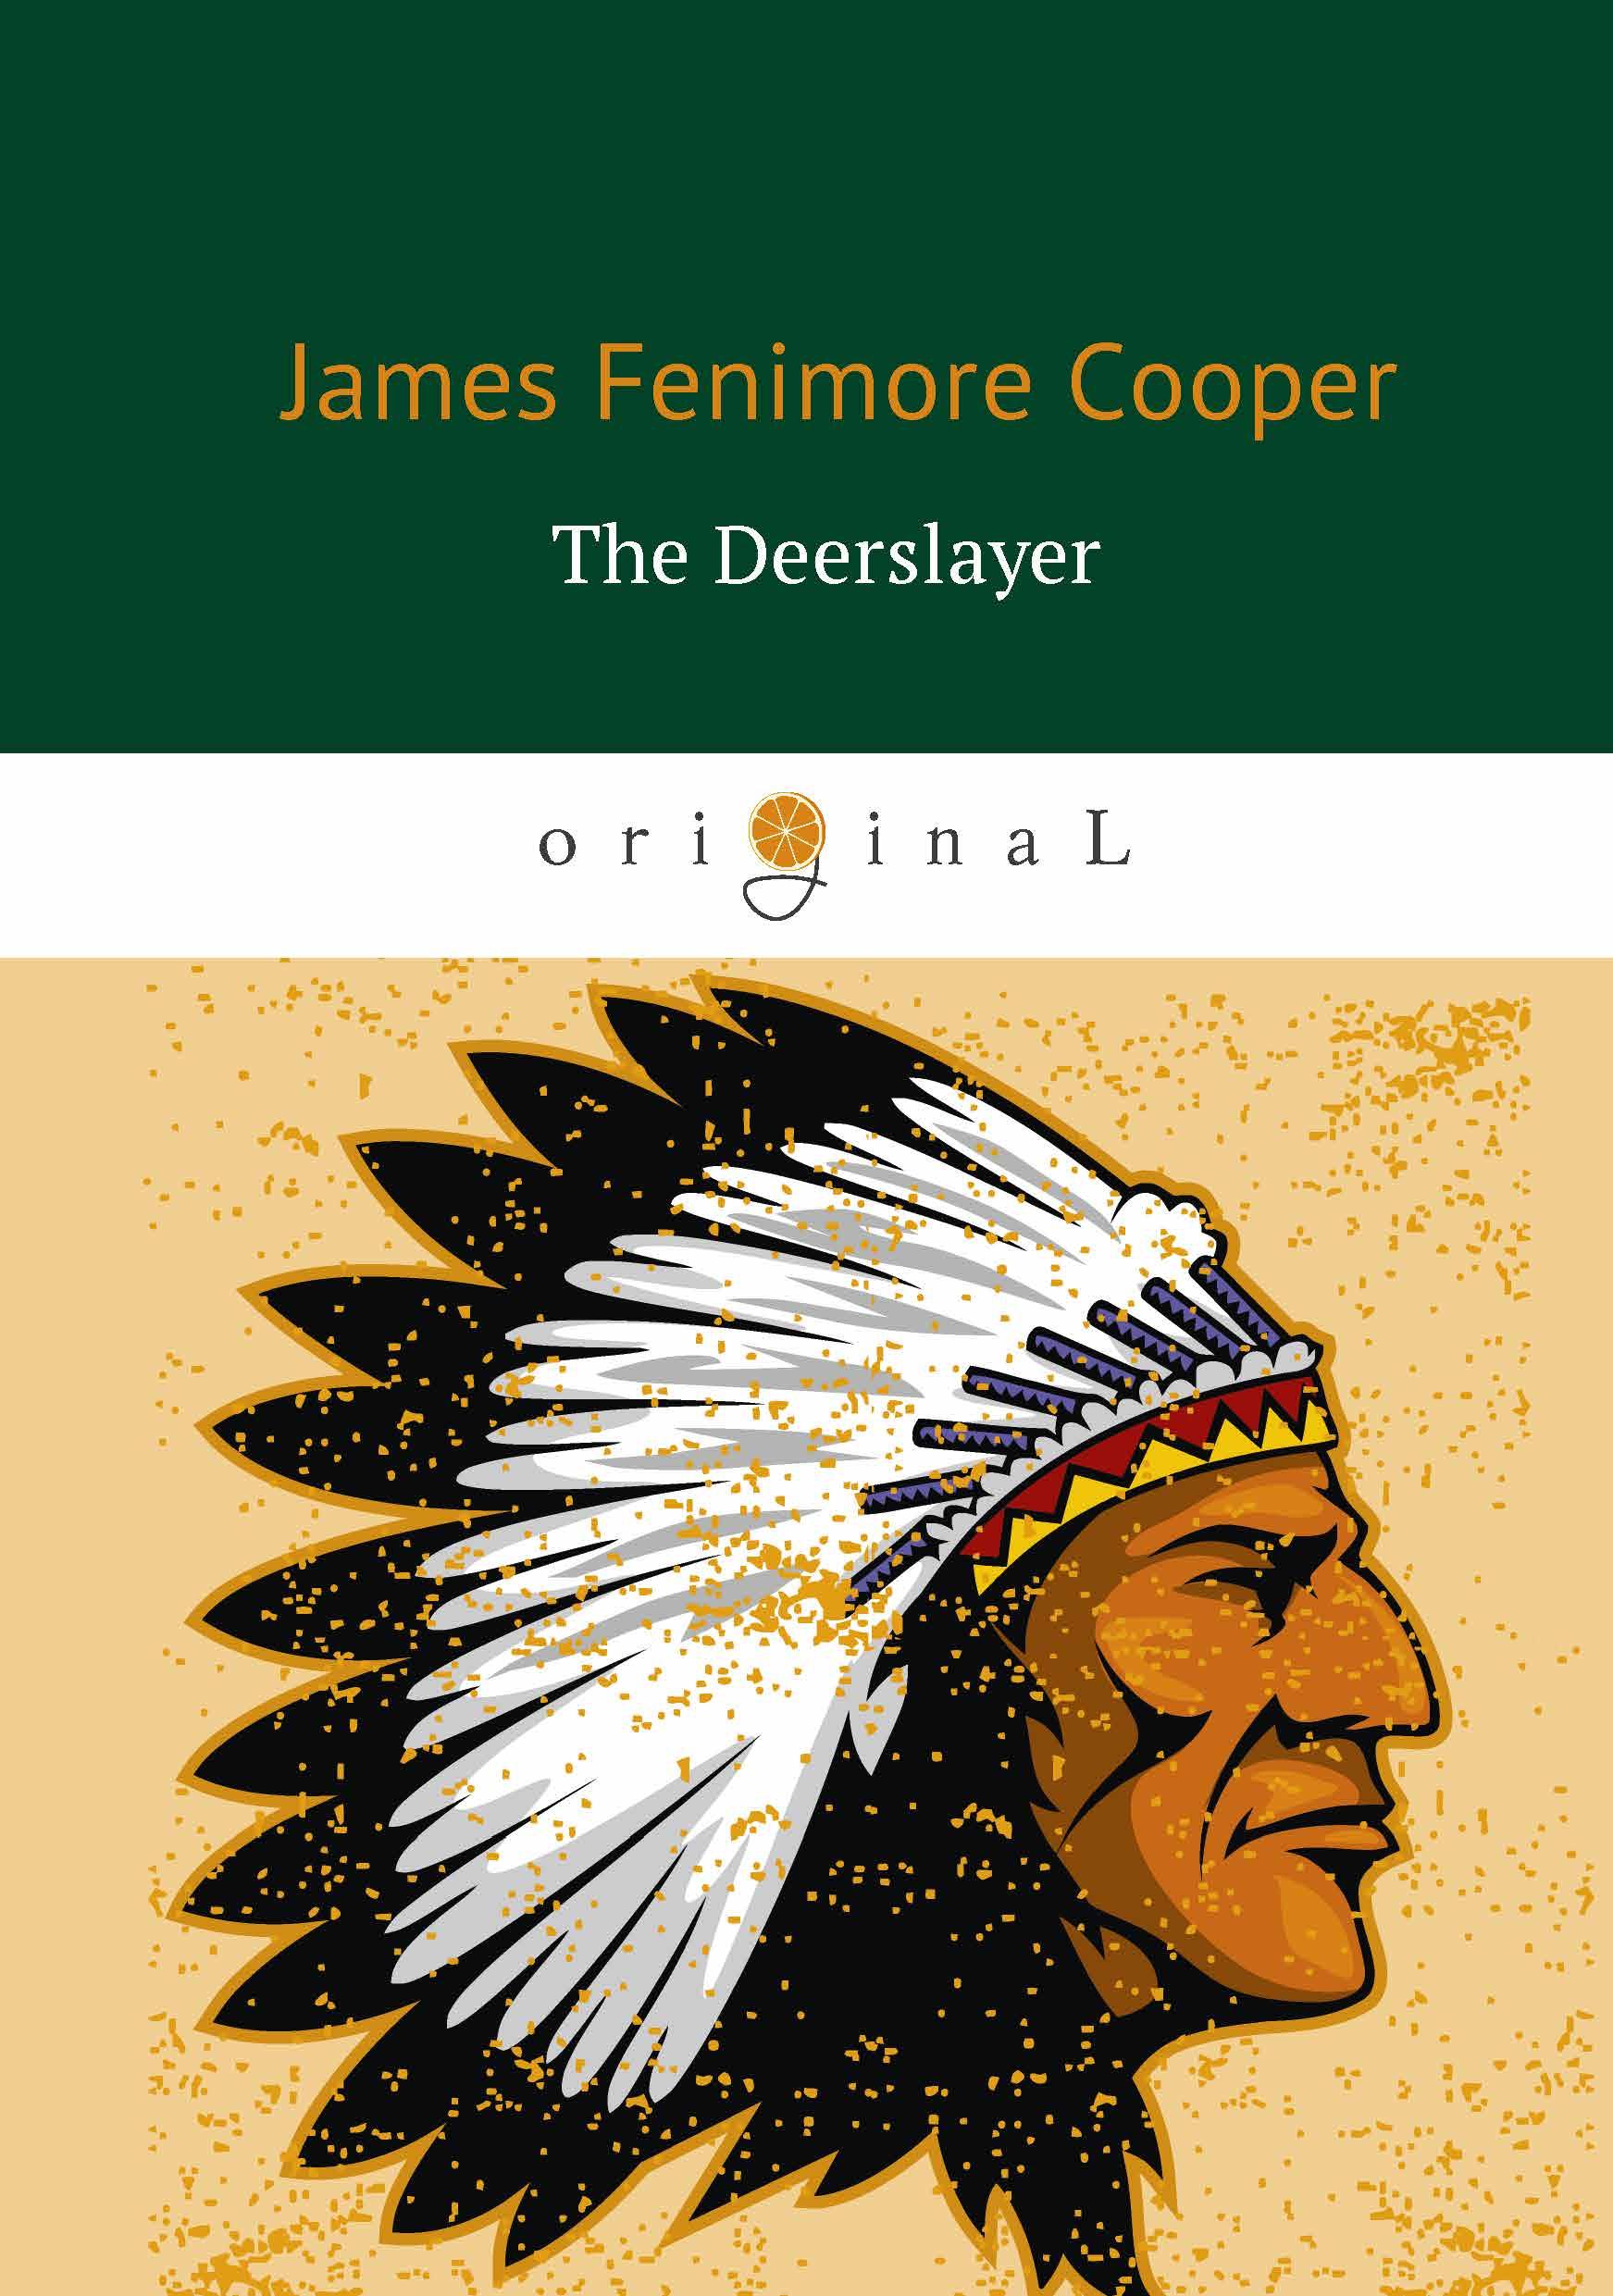 James Fenimore Cooper The Deerslayer / Зверобой, или Первая тропа войны moffett cleveland careers of danger and daring